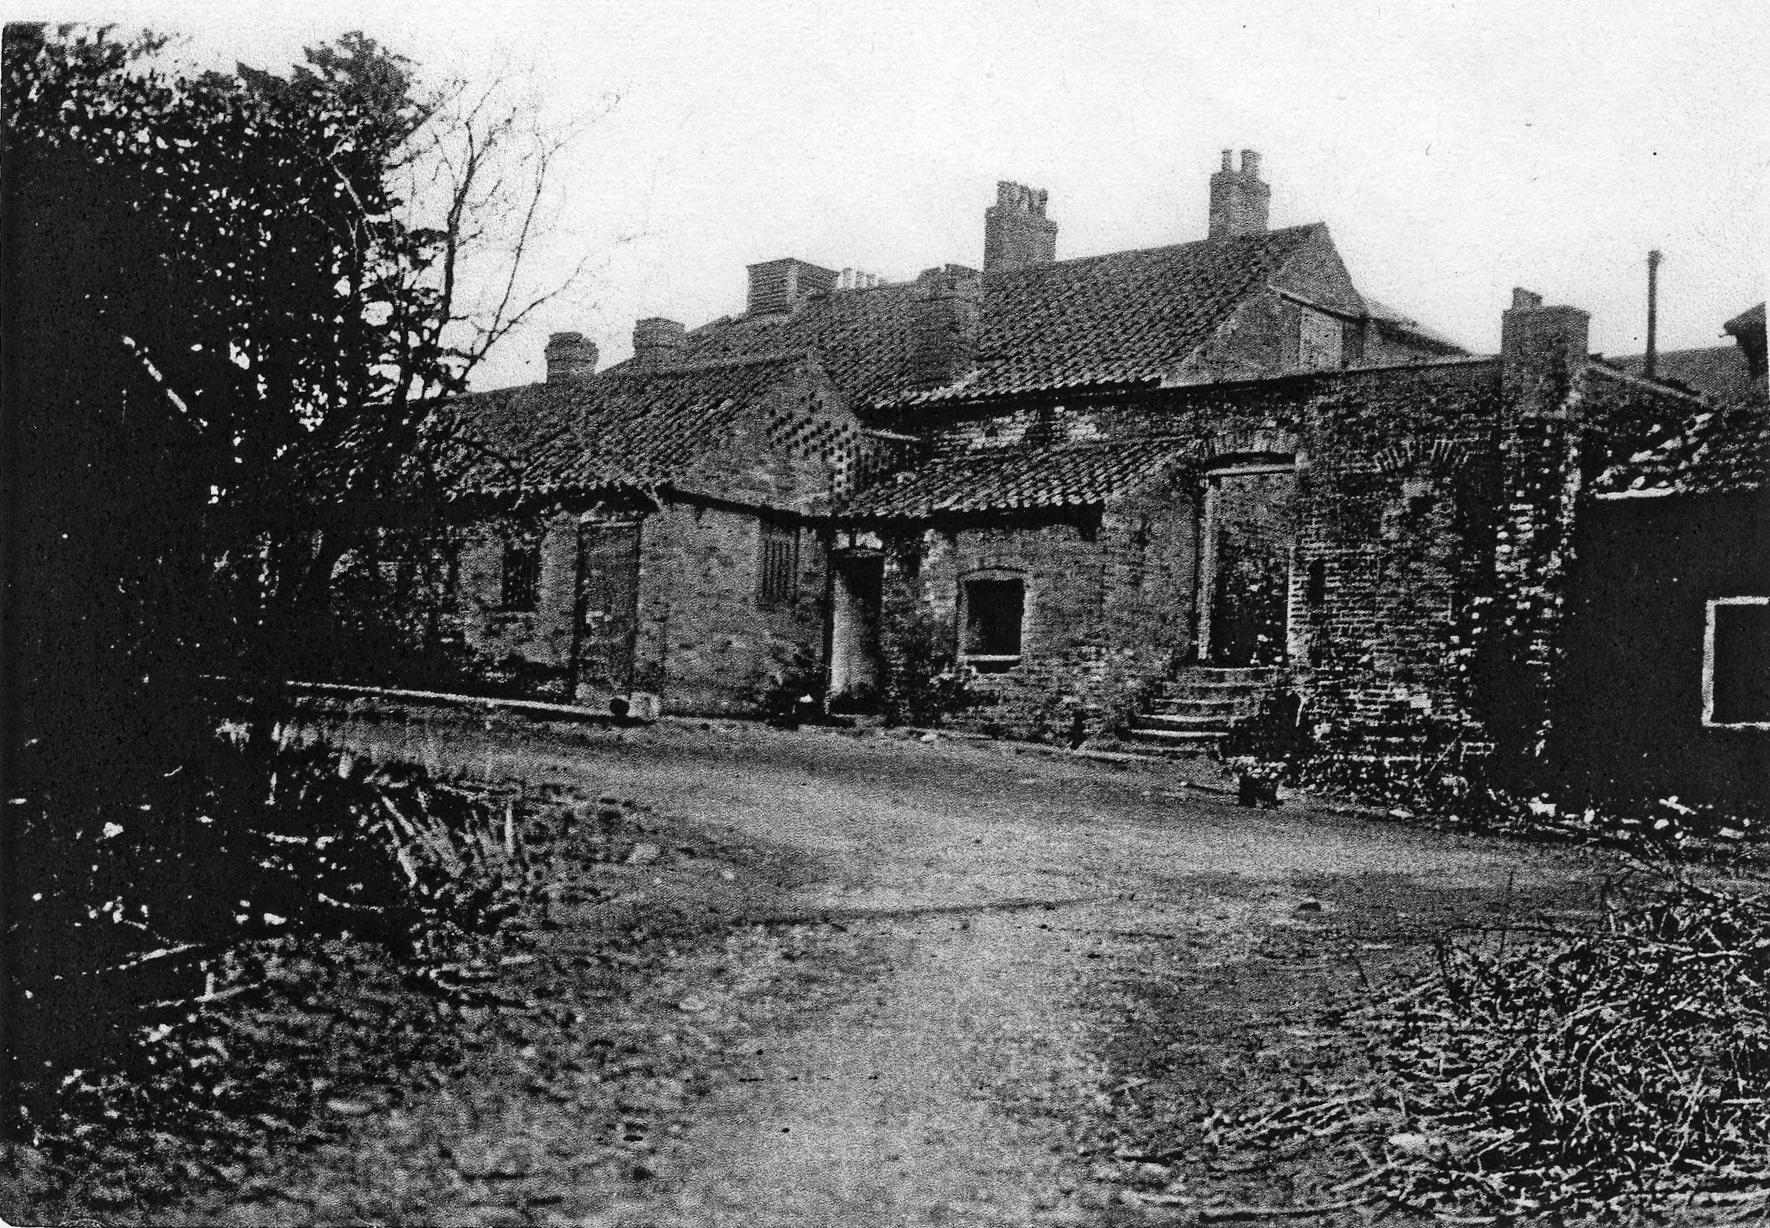 Edwinstowe Cockglode House c1955